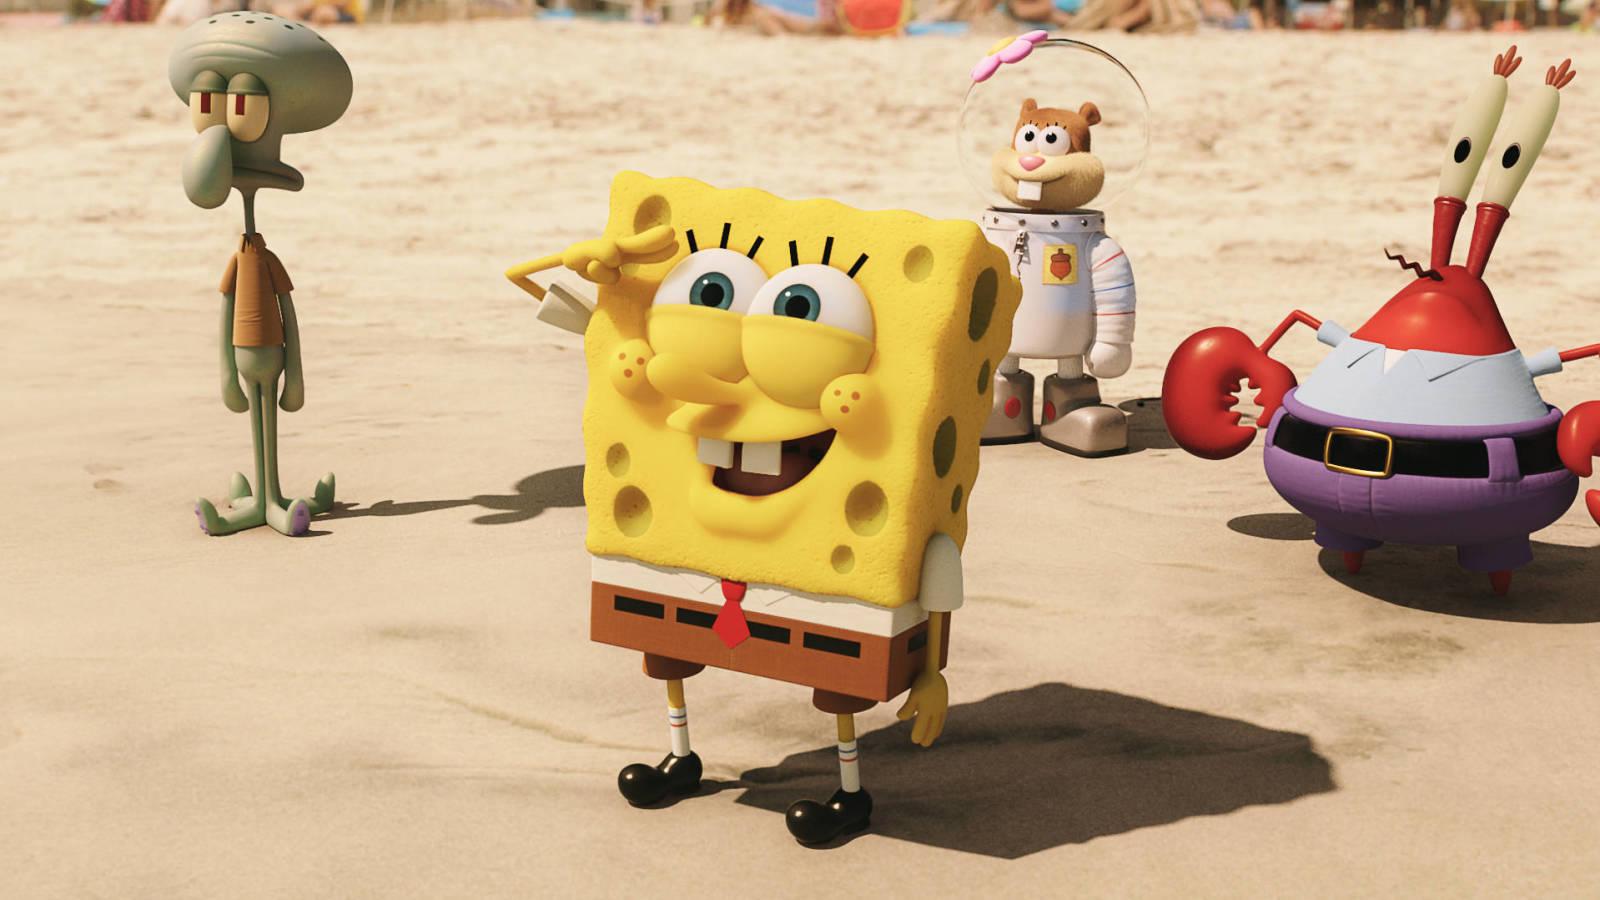 www.yardbarker.com: Nickelodeon explains why 'Kwarantined Krab' was pulled from 'SpongeBob' rotation